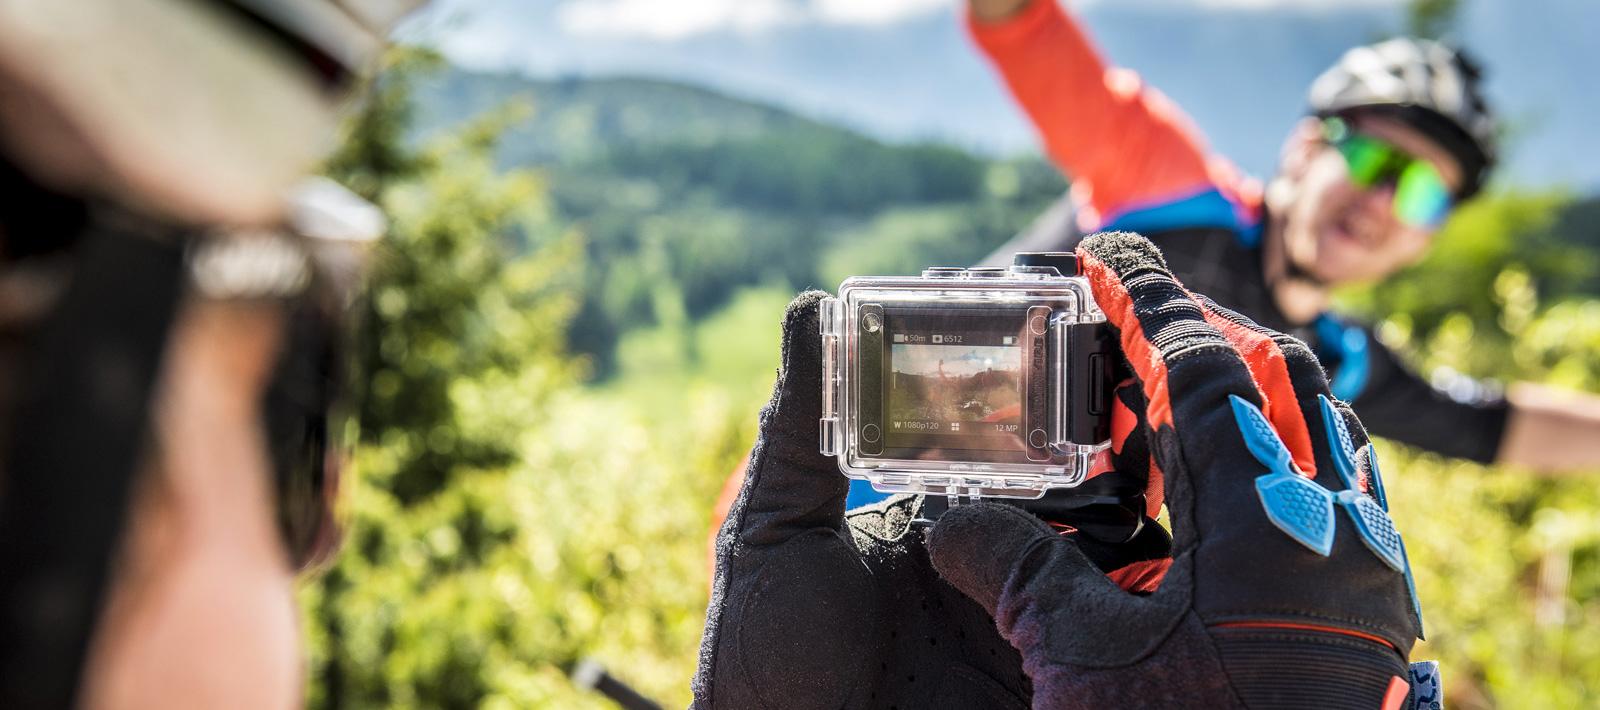 VIRB series (Action Cameras)